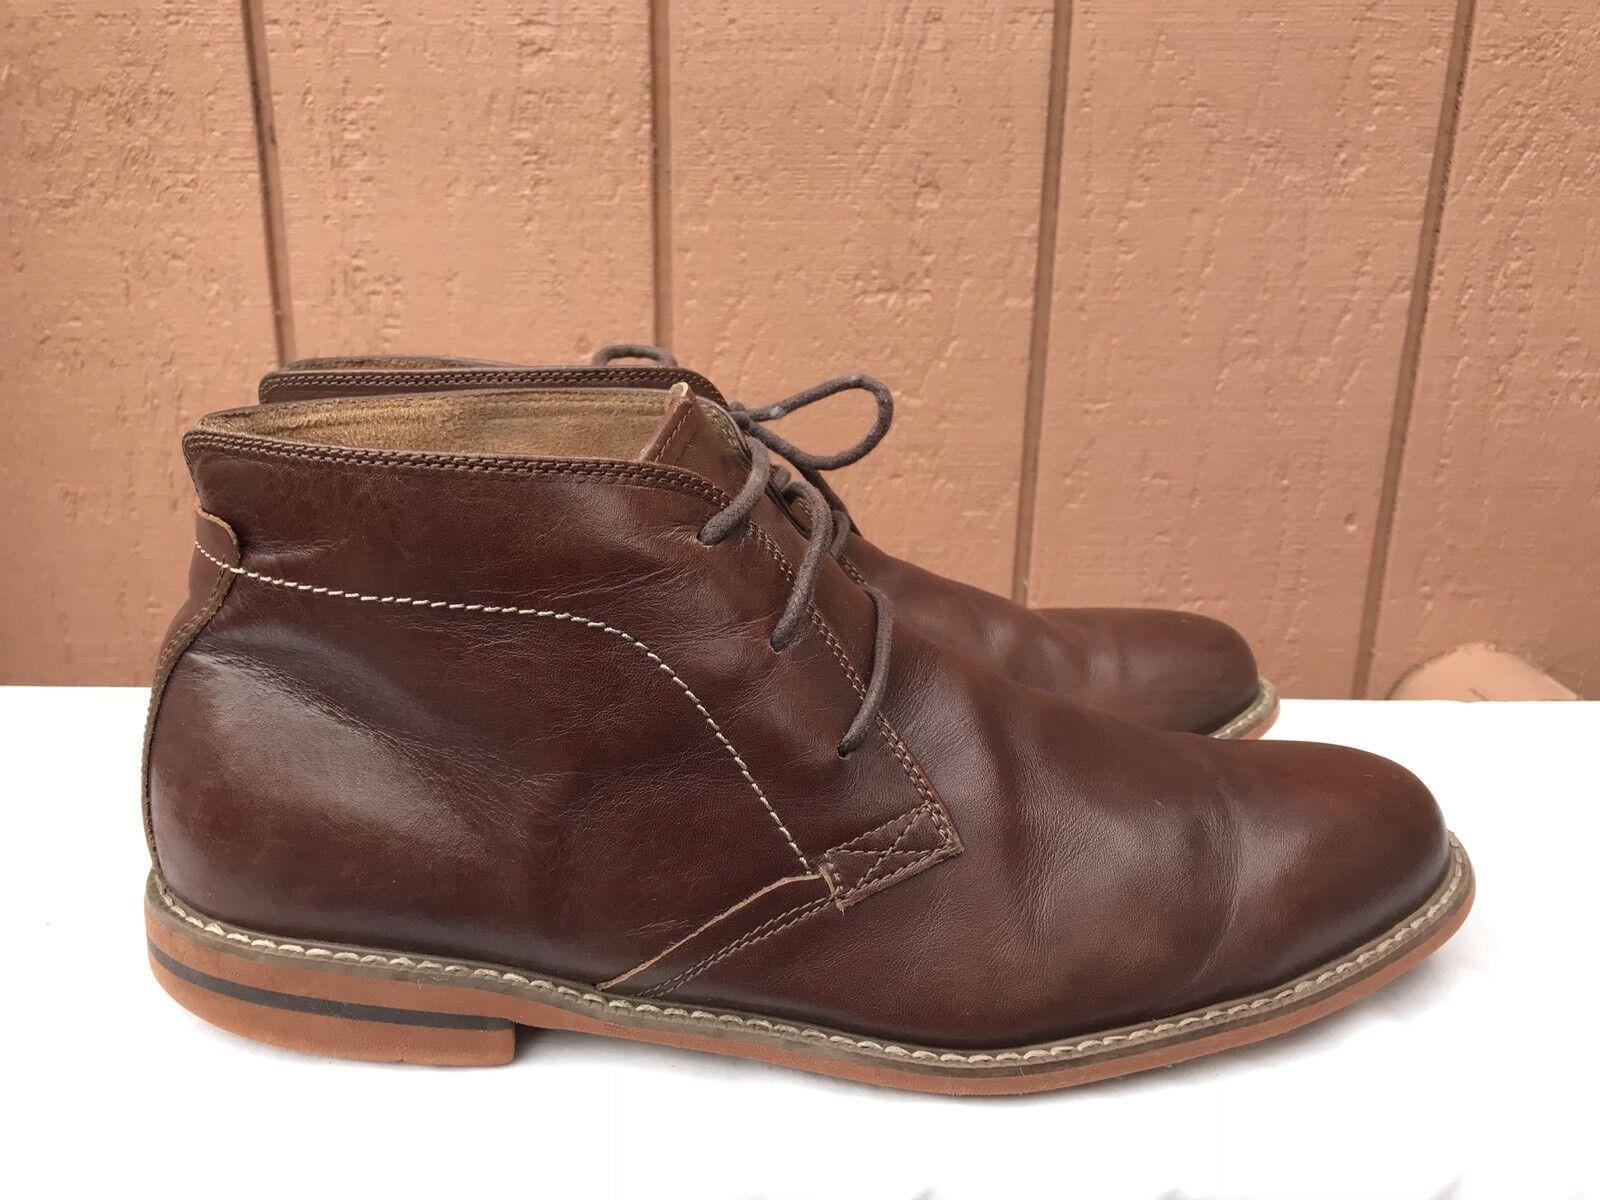 Excelente condición usada para hombre Florsheim Tobillo Chukka Marrón Cuero Con Cordones botas Talla EE. UU. 14M